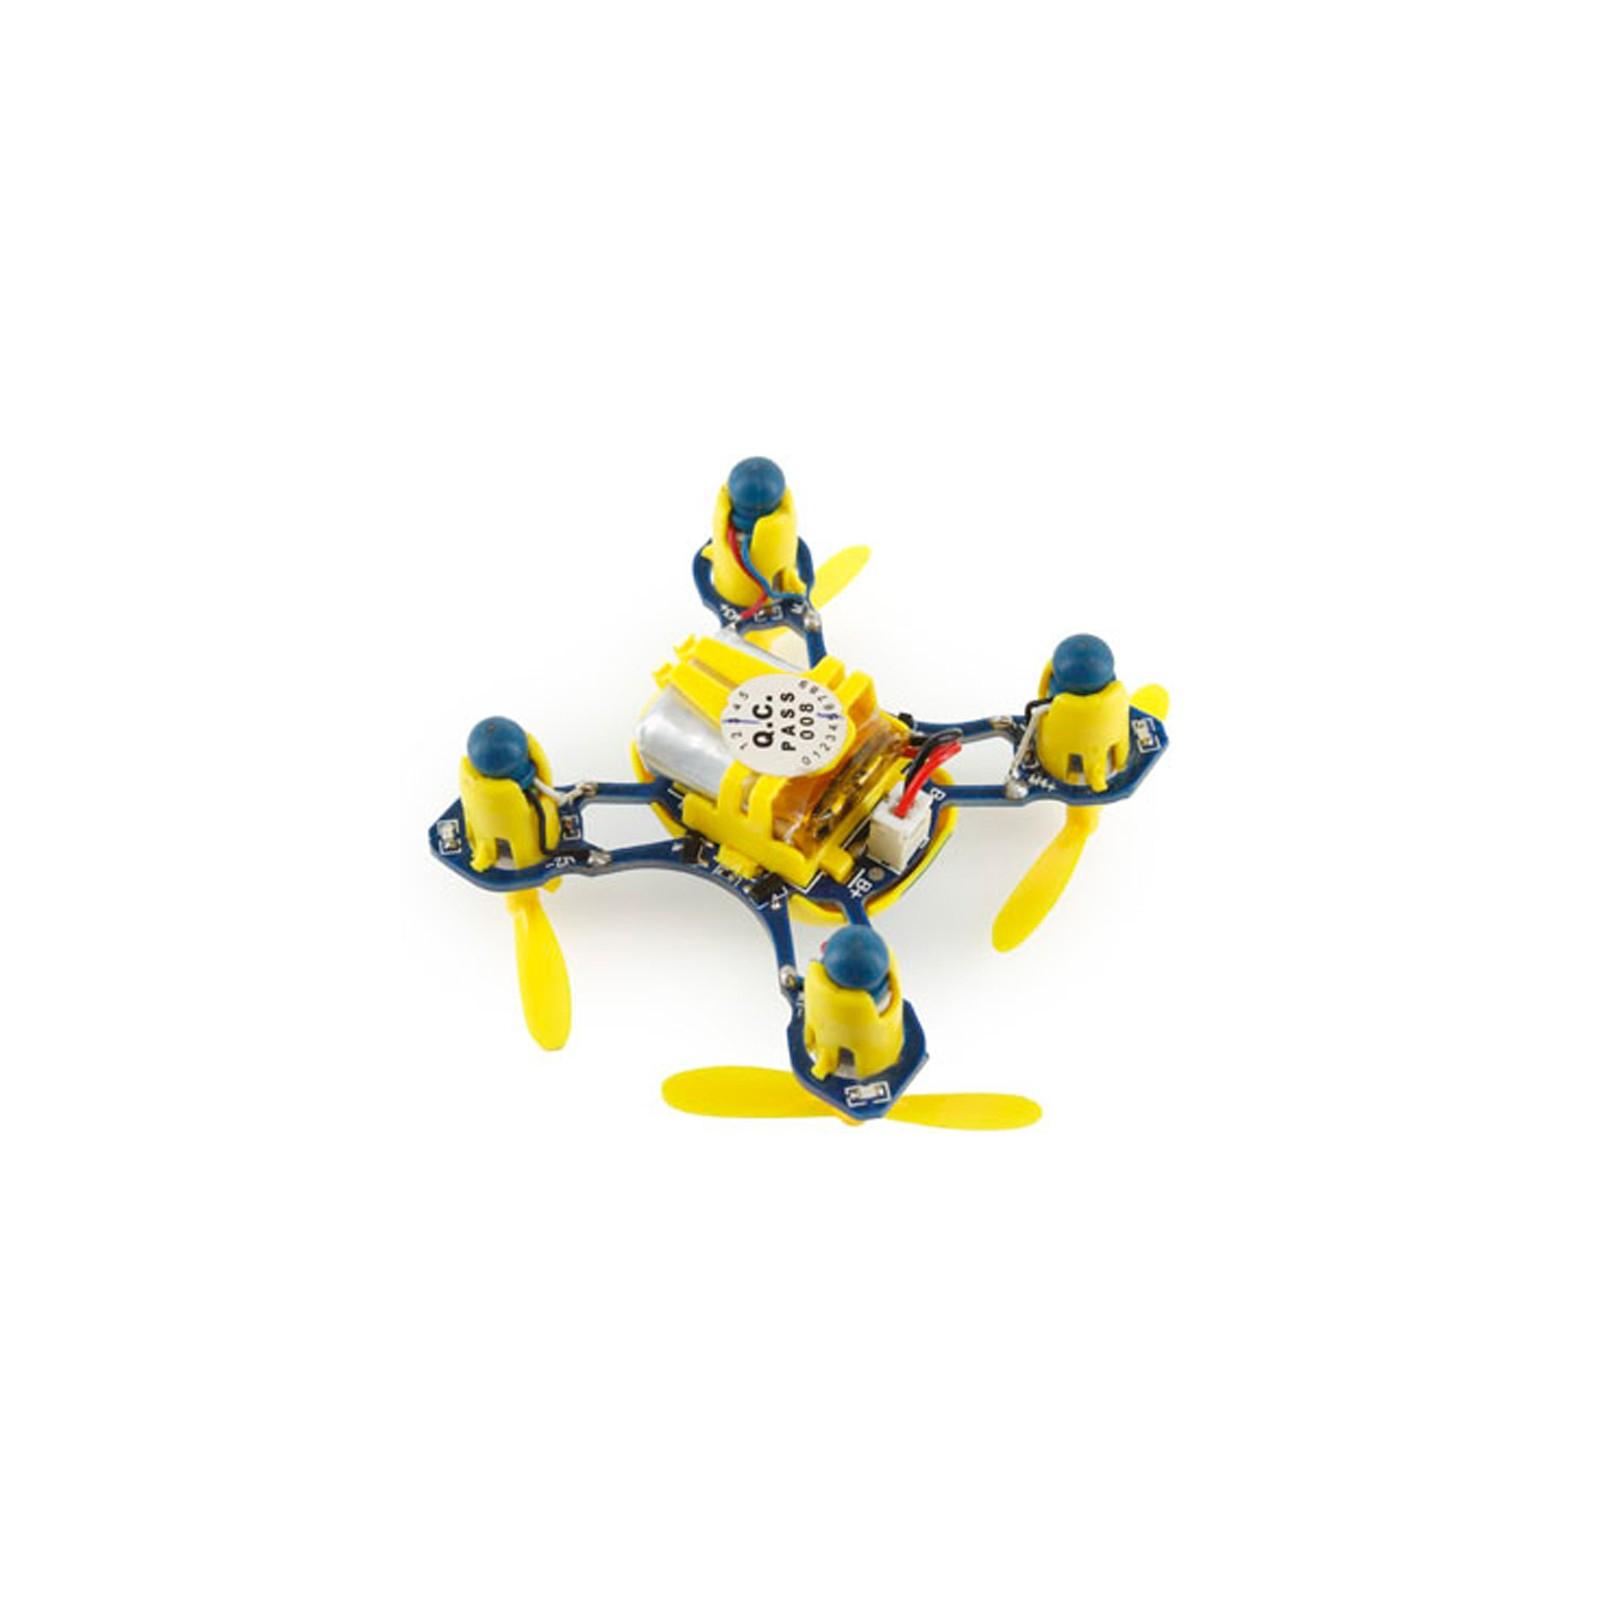 Квадрокоптер UDIRC 2,4 GHz 40 мм мини 3.7V (U840 Yellow/Blue) изображение 5